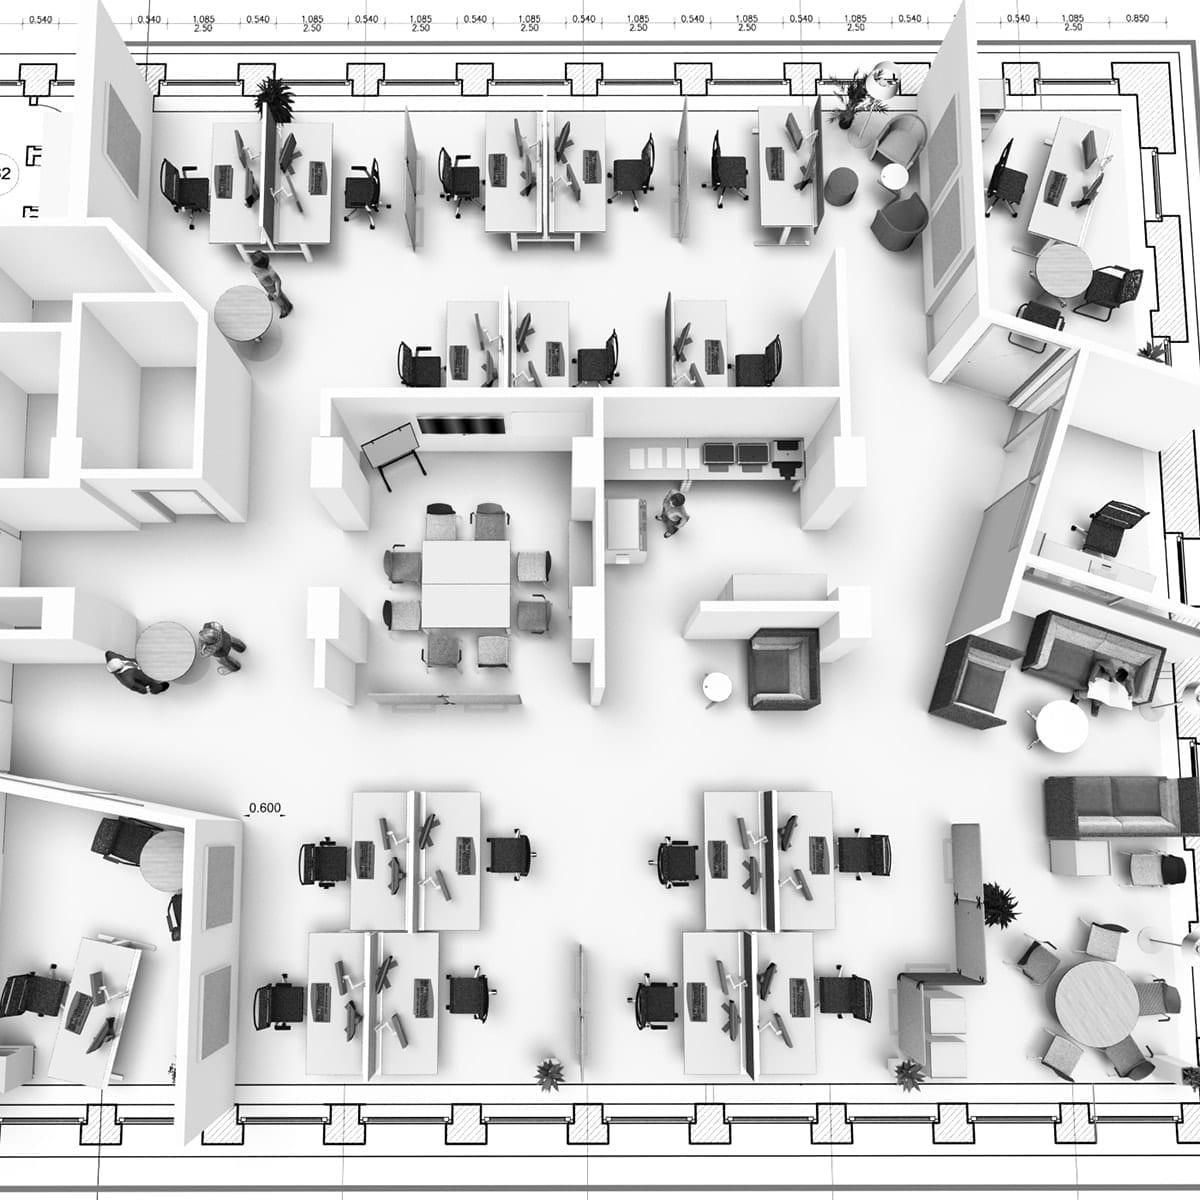 Büroplanung Planungsdetail